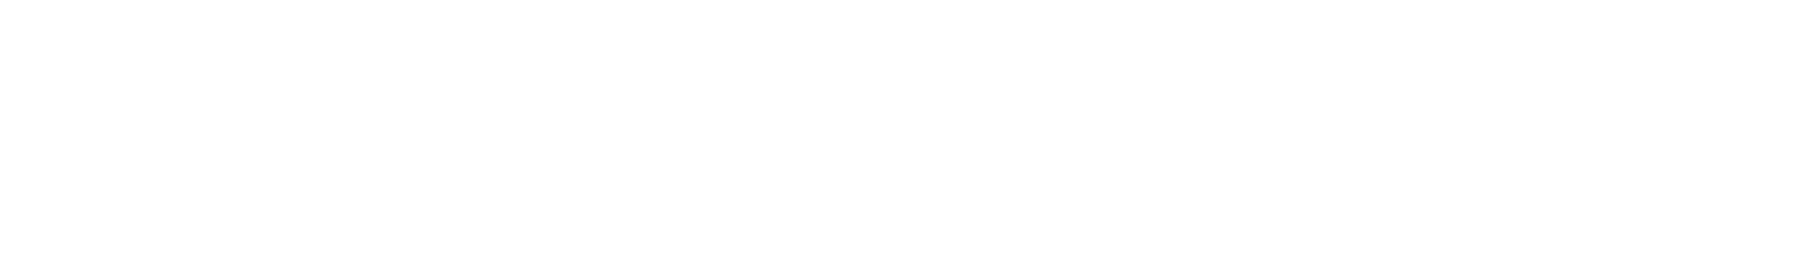 110 gsm tenor sp05